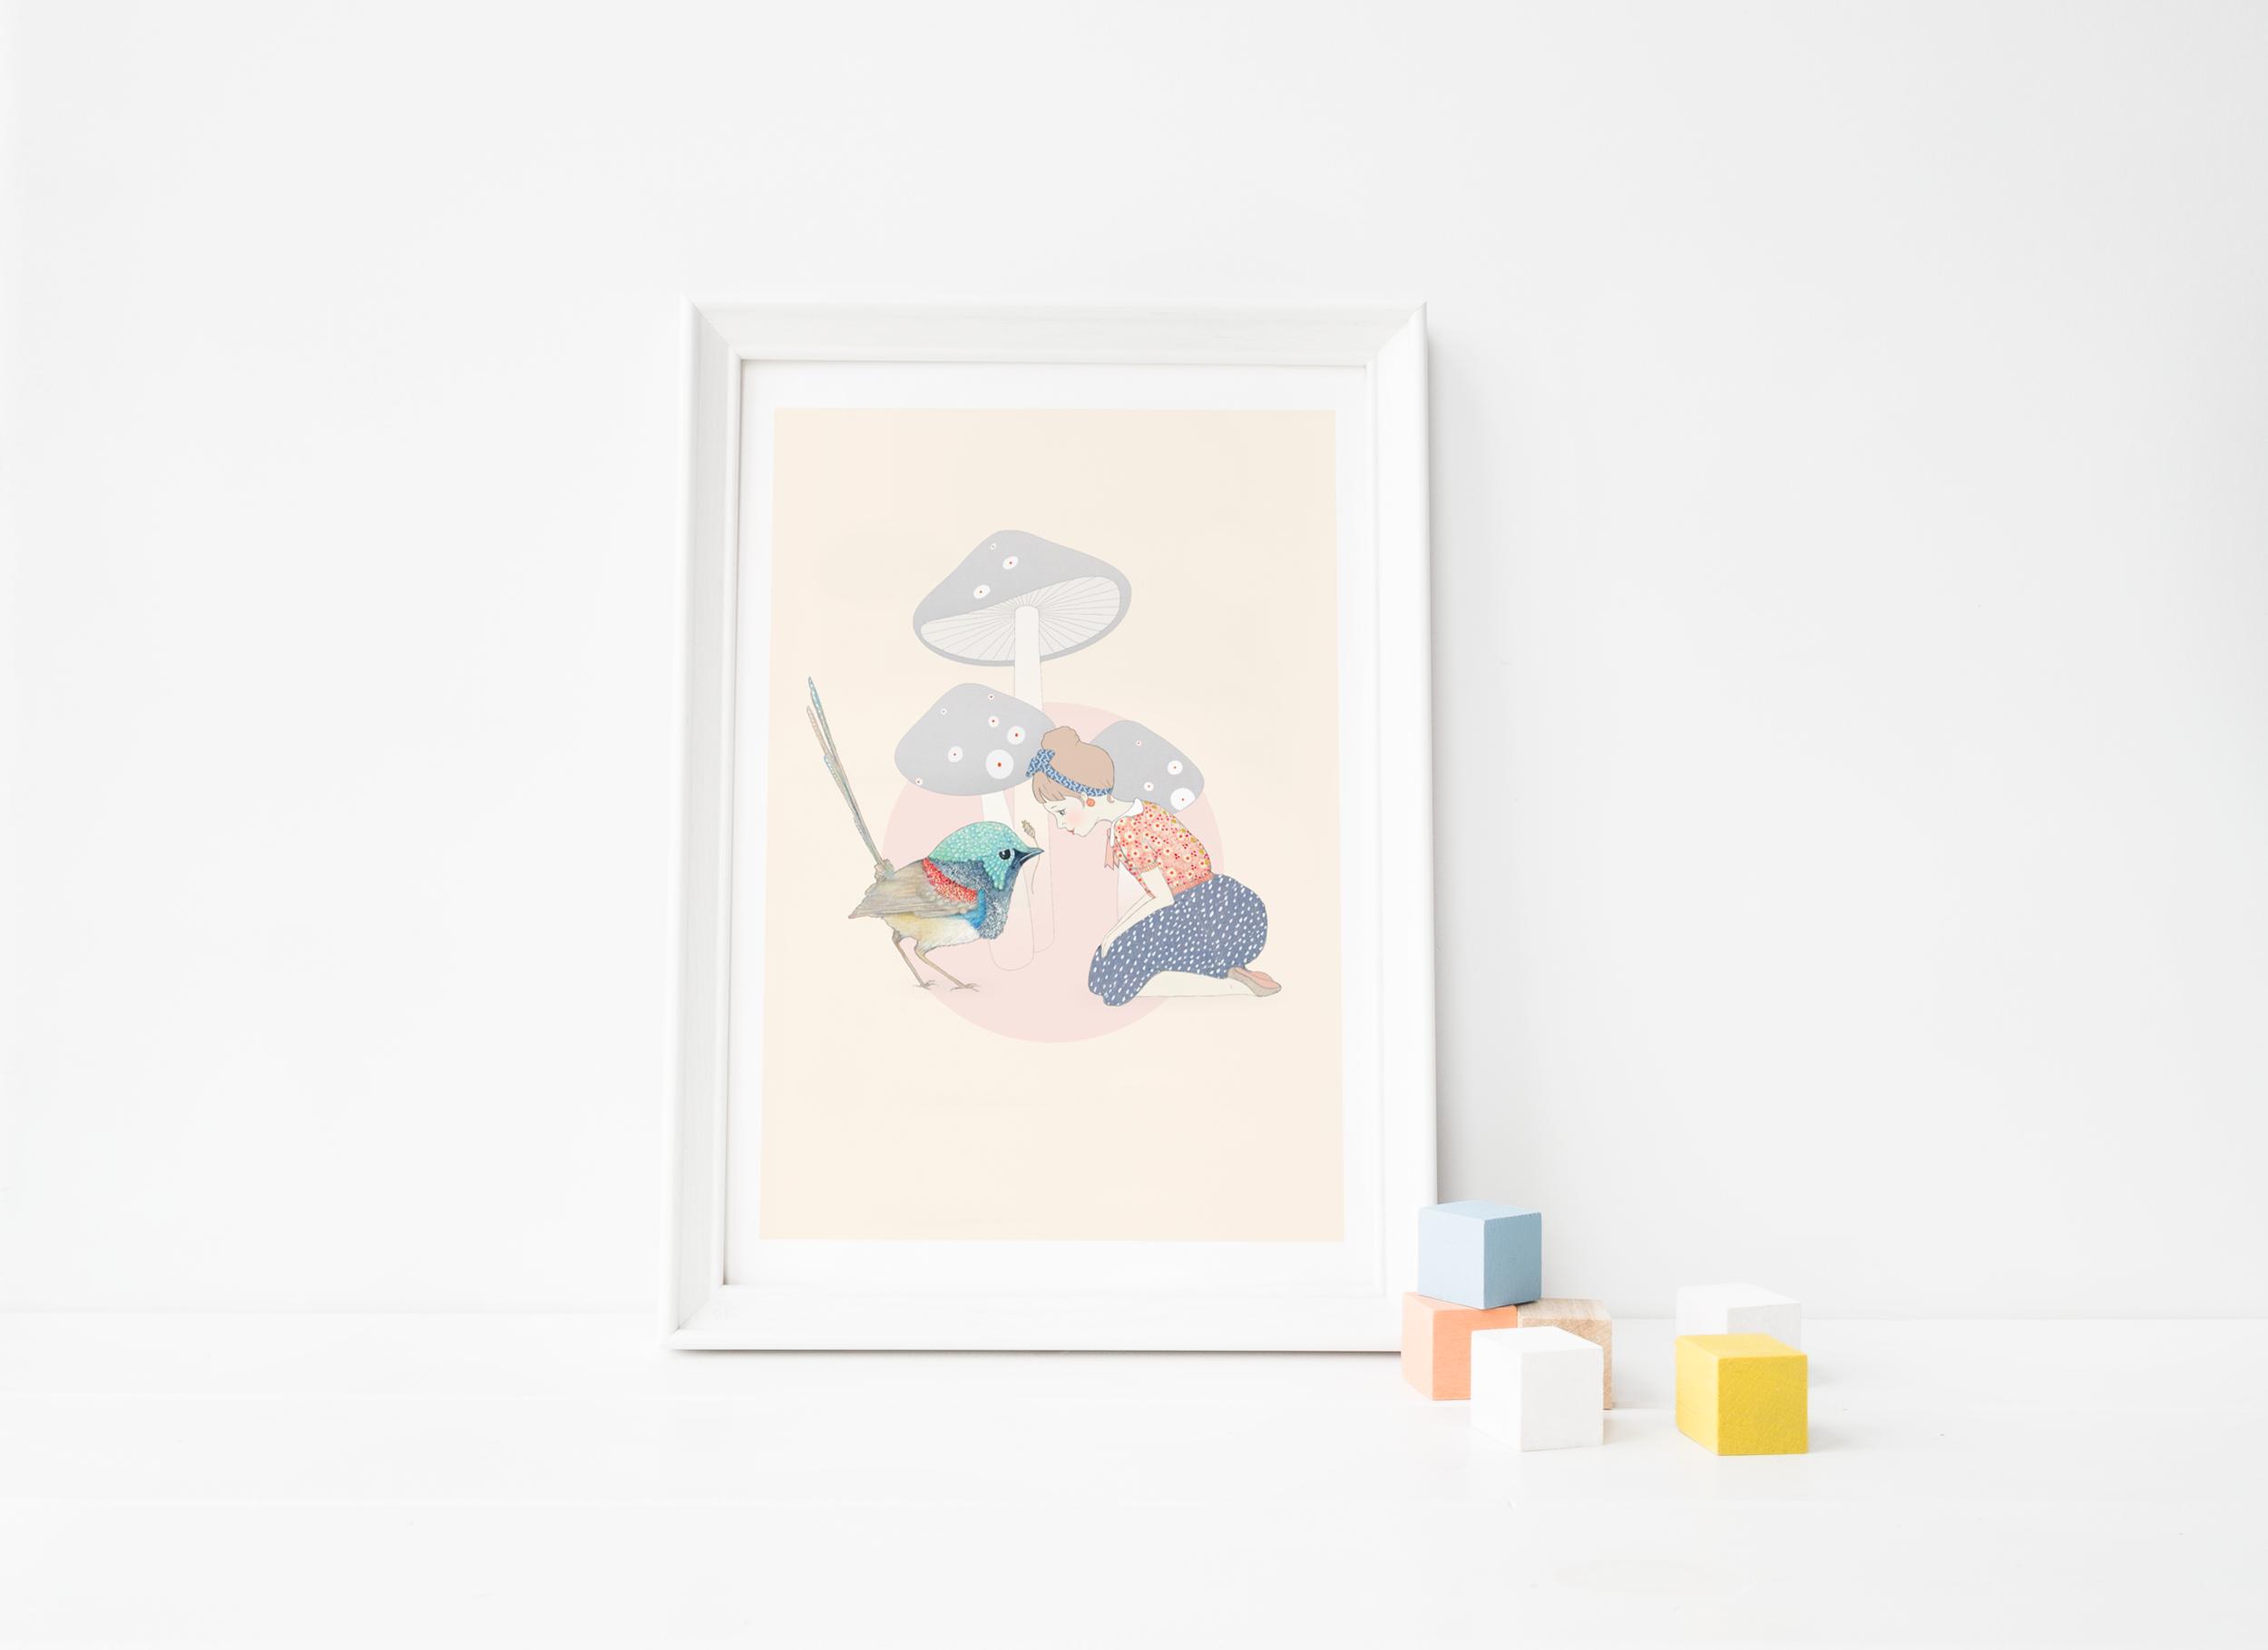 Imaginary Worlds - Prints